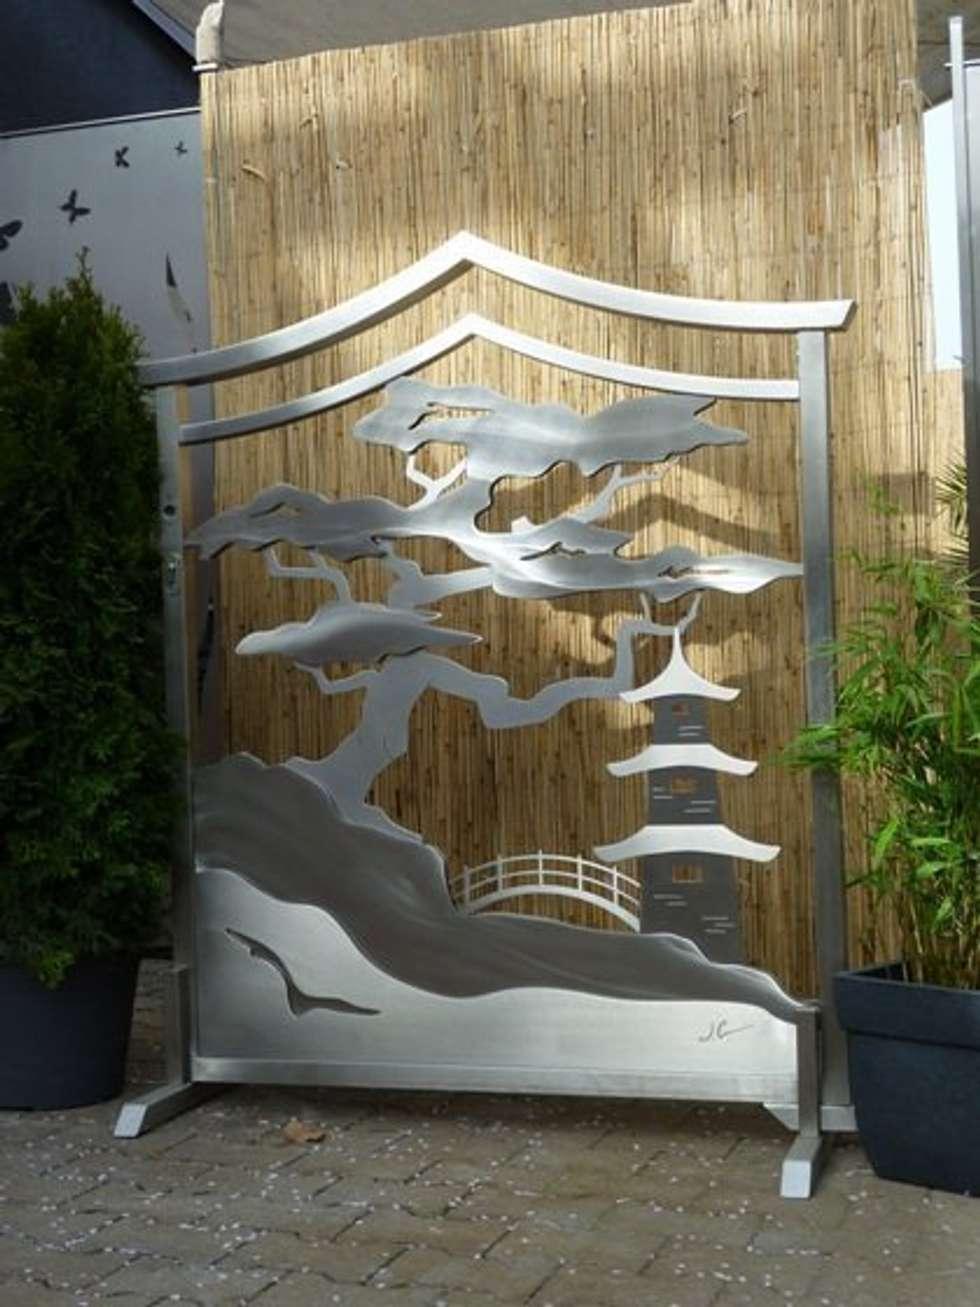 Edelstahl Tor: asiatischer Garten von Edelstahl Atelier Crouse - Stainless Steel Atelier